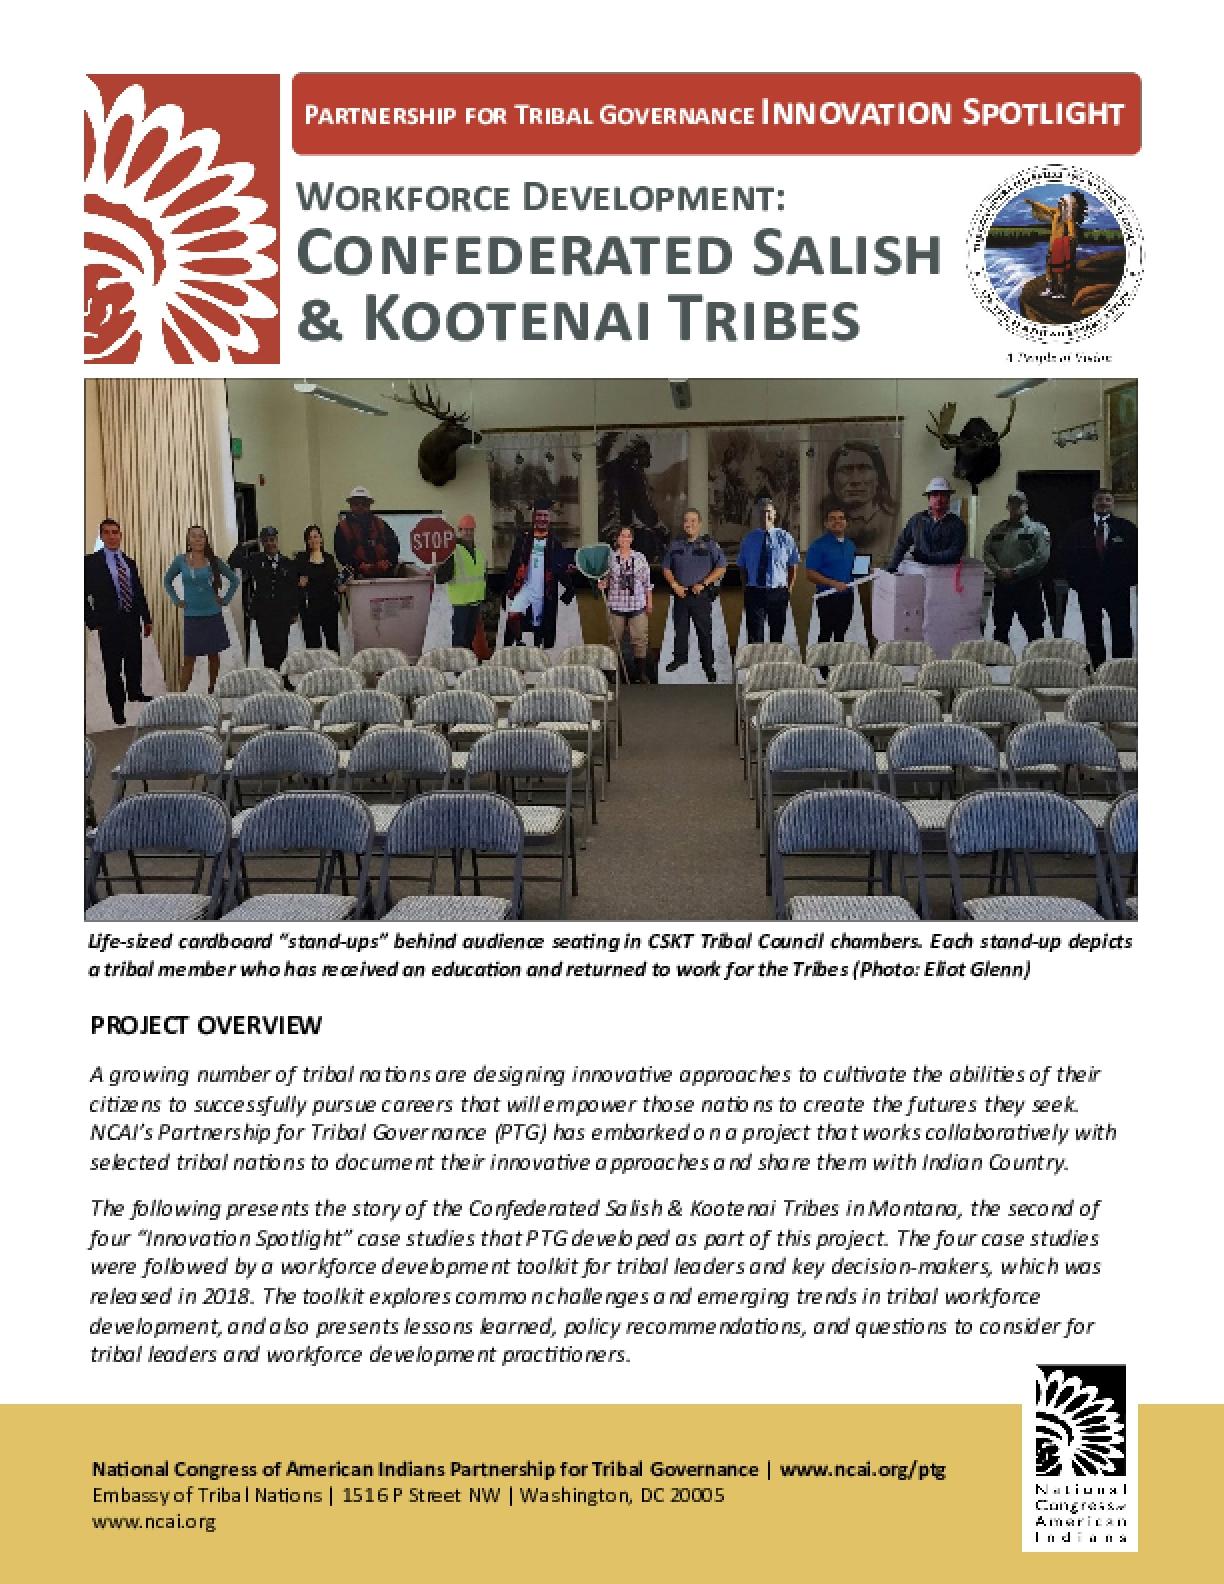 Workforce Development: Confederated Salish & Kootenai Tribes